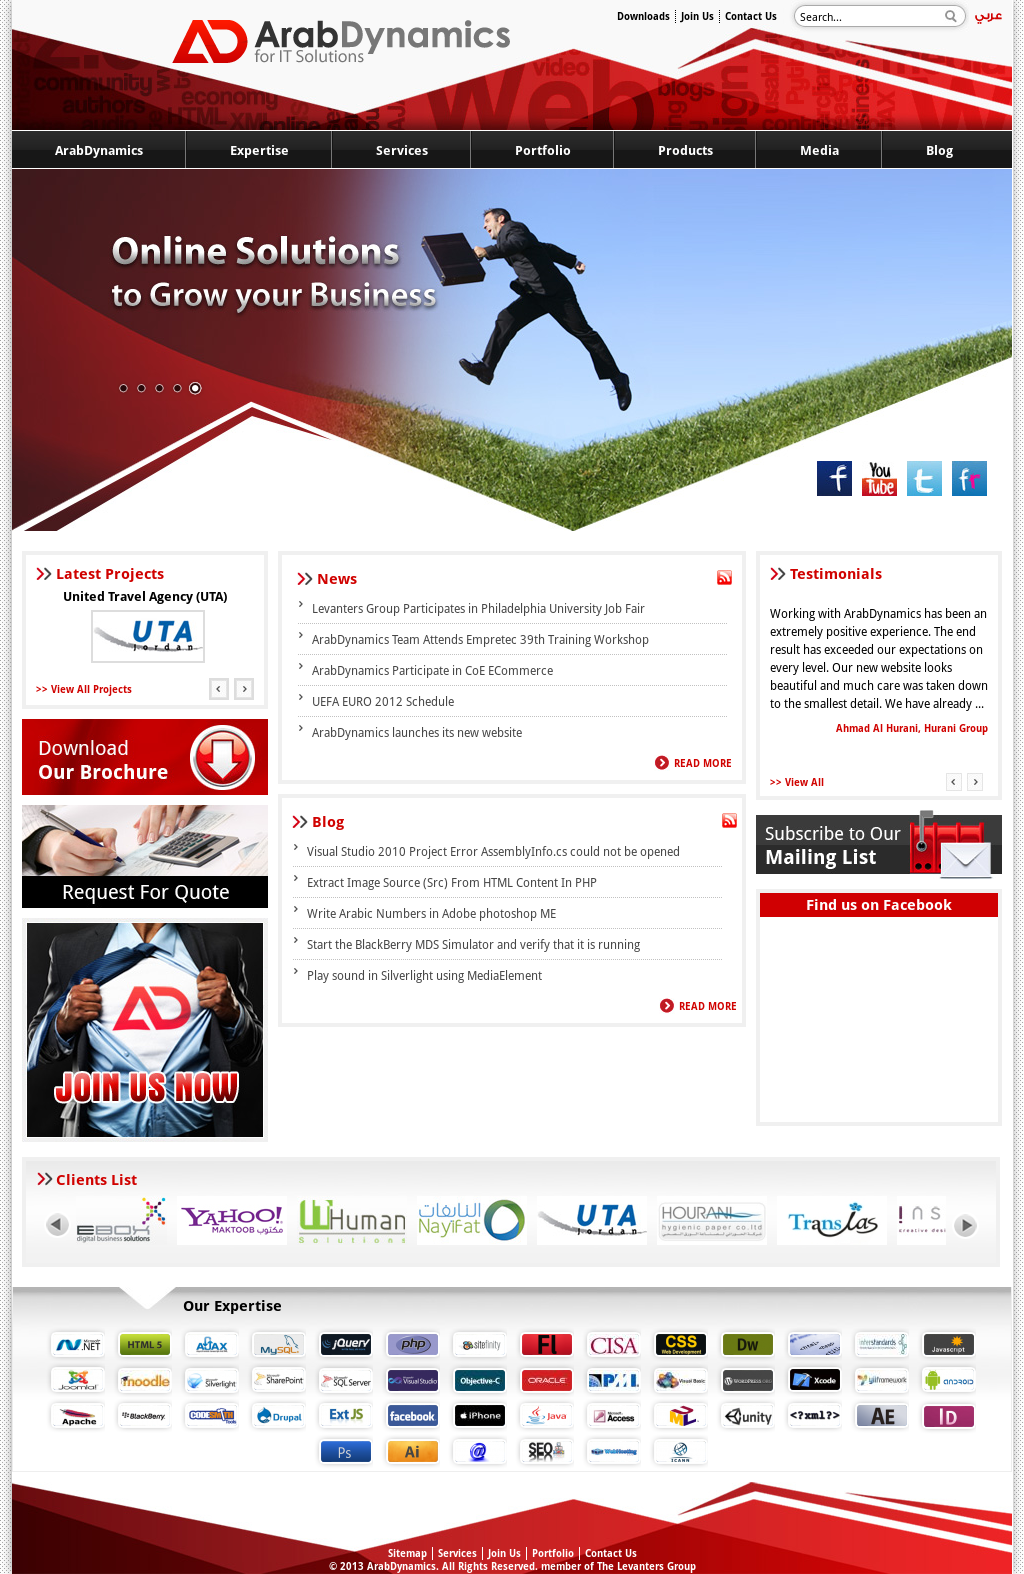 Arabdynamics Competitors, Revenue and Employees - Owler Company Profile